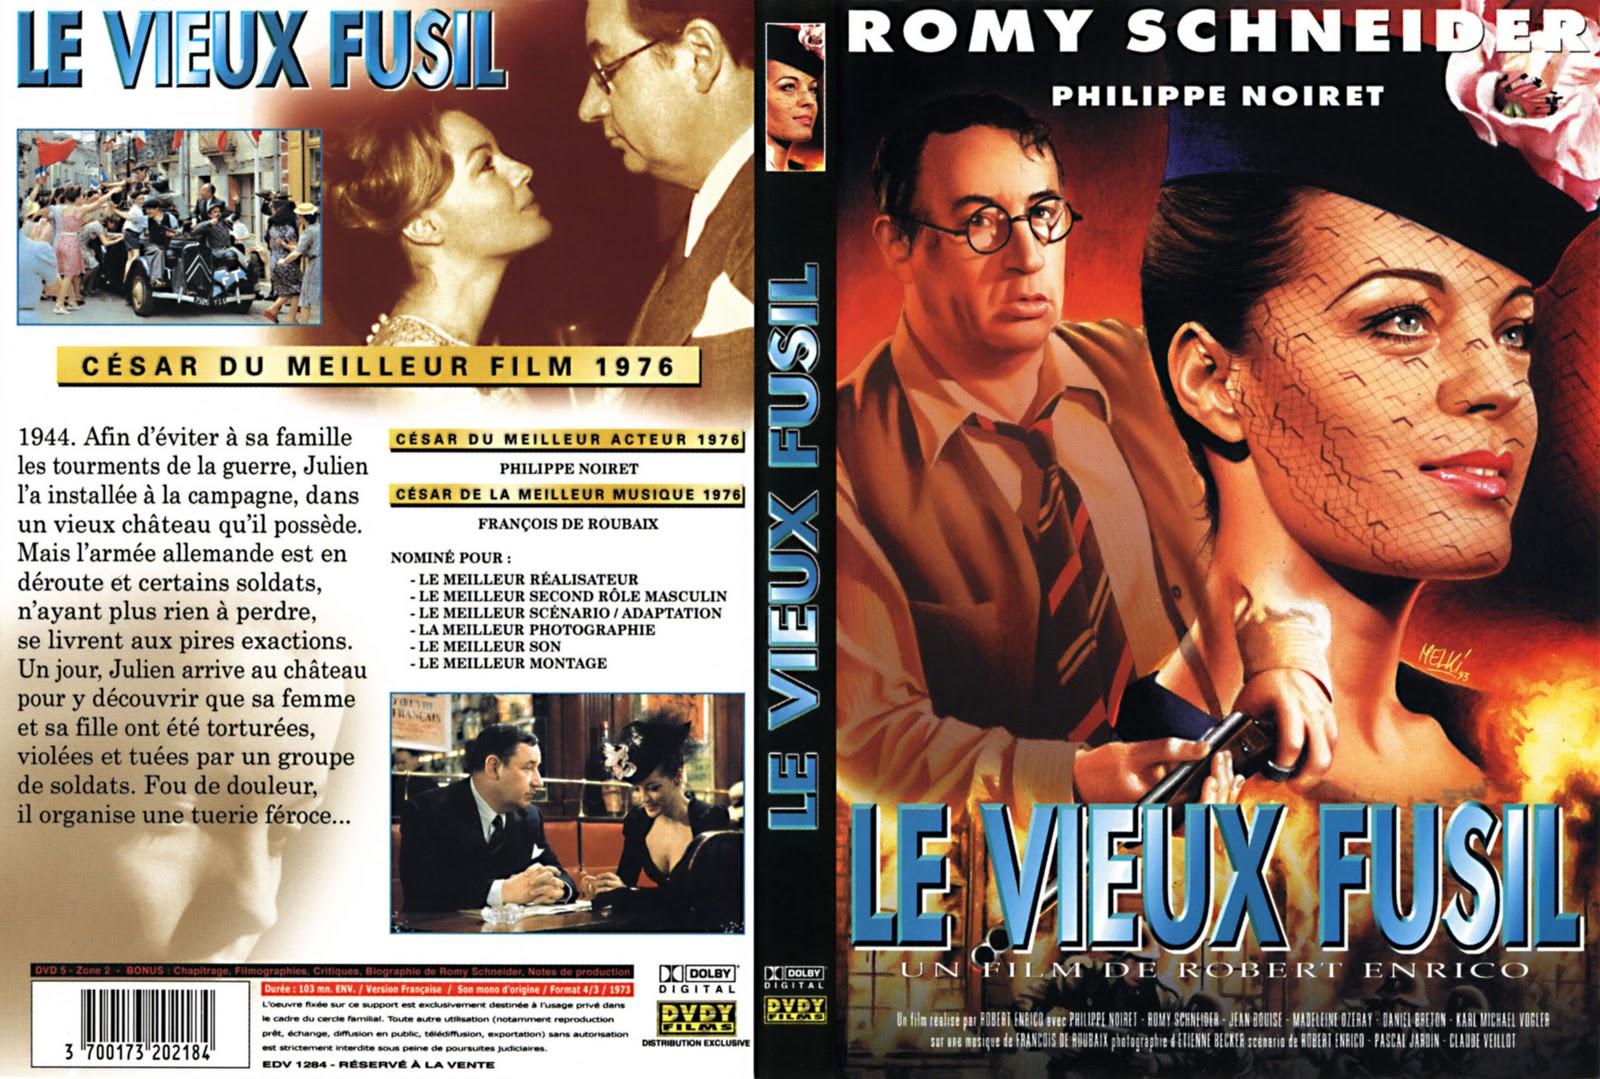 http://3.bp.blogspot.com/_psfONwcvHlM/TK47FmQiJfI/AAAAAAAADUc/9ne5wEsfJE4/s1600/Le_vieux_fusil-19513601022008.jpg